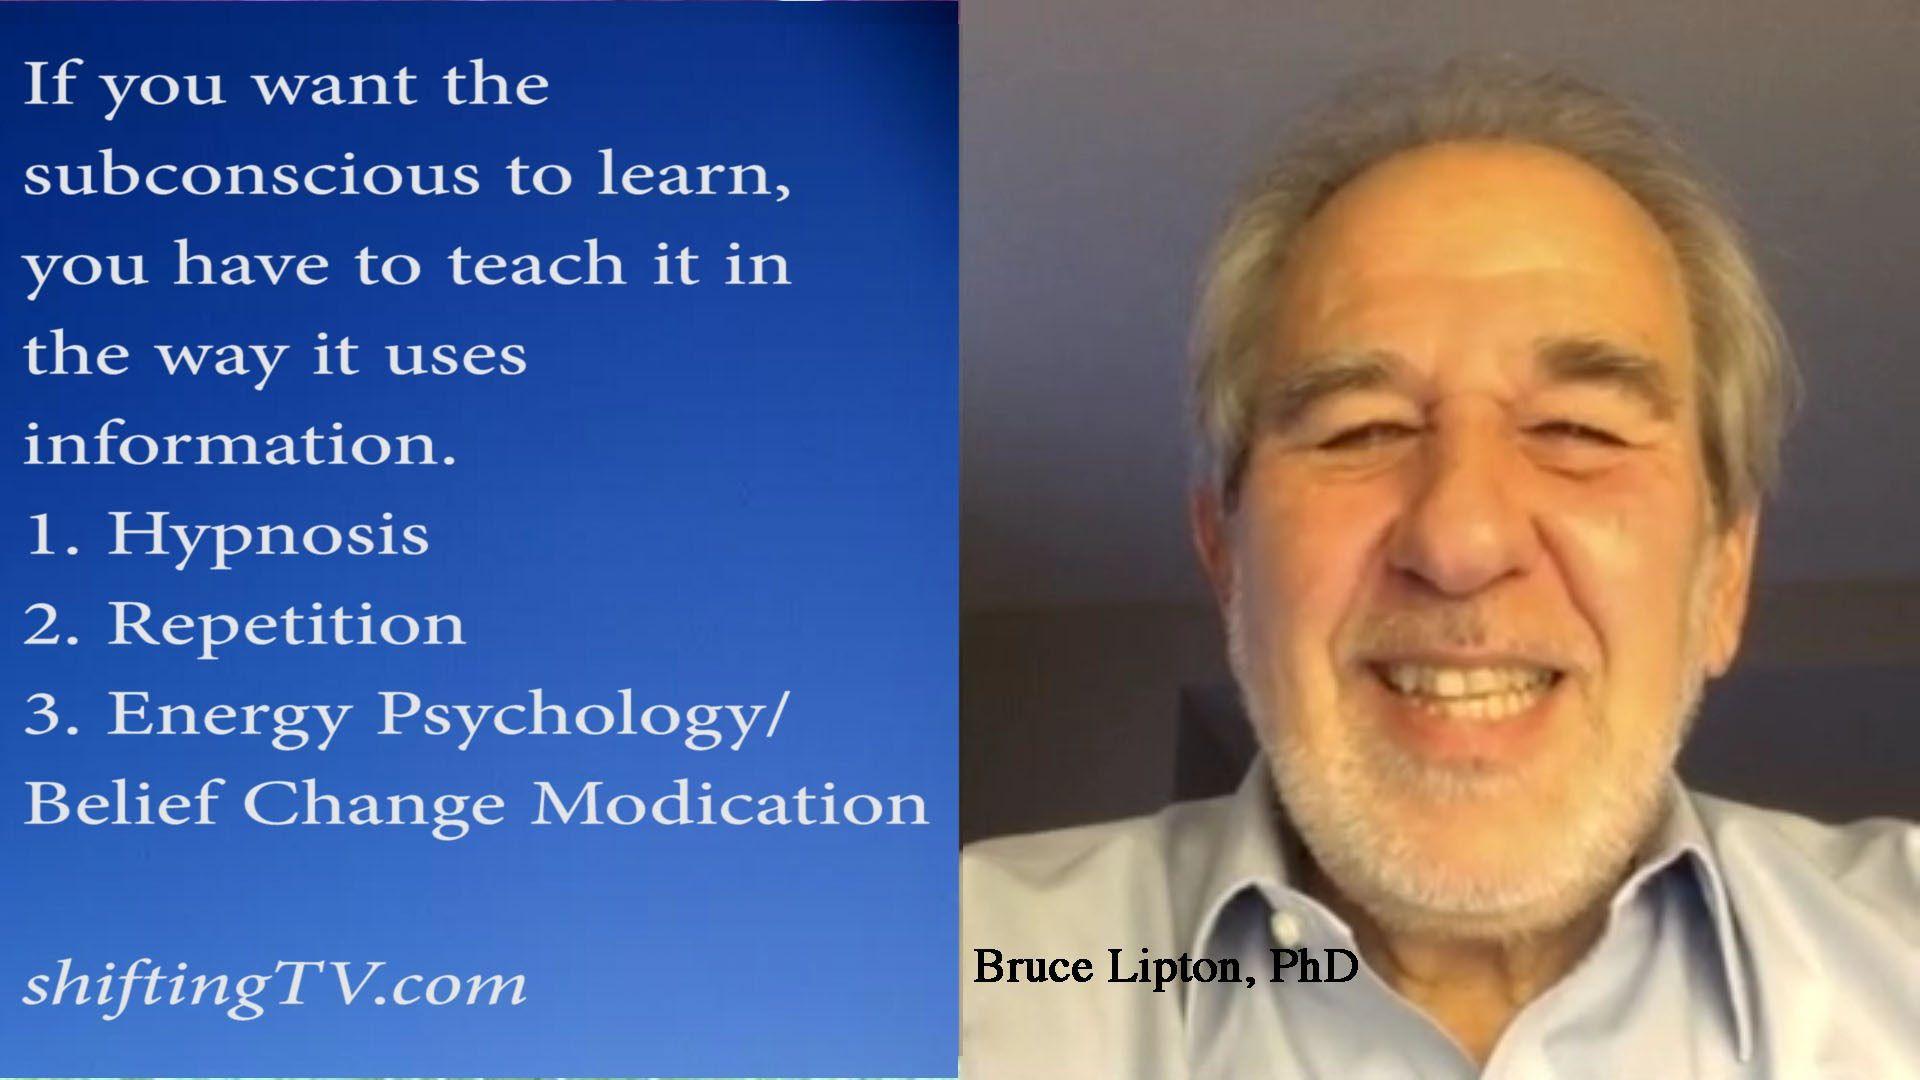 Bruce Lipton Rewrite Subconscious Programming Quickly Shiftingtv Biology Of Belief Energy Psychology Subconscious